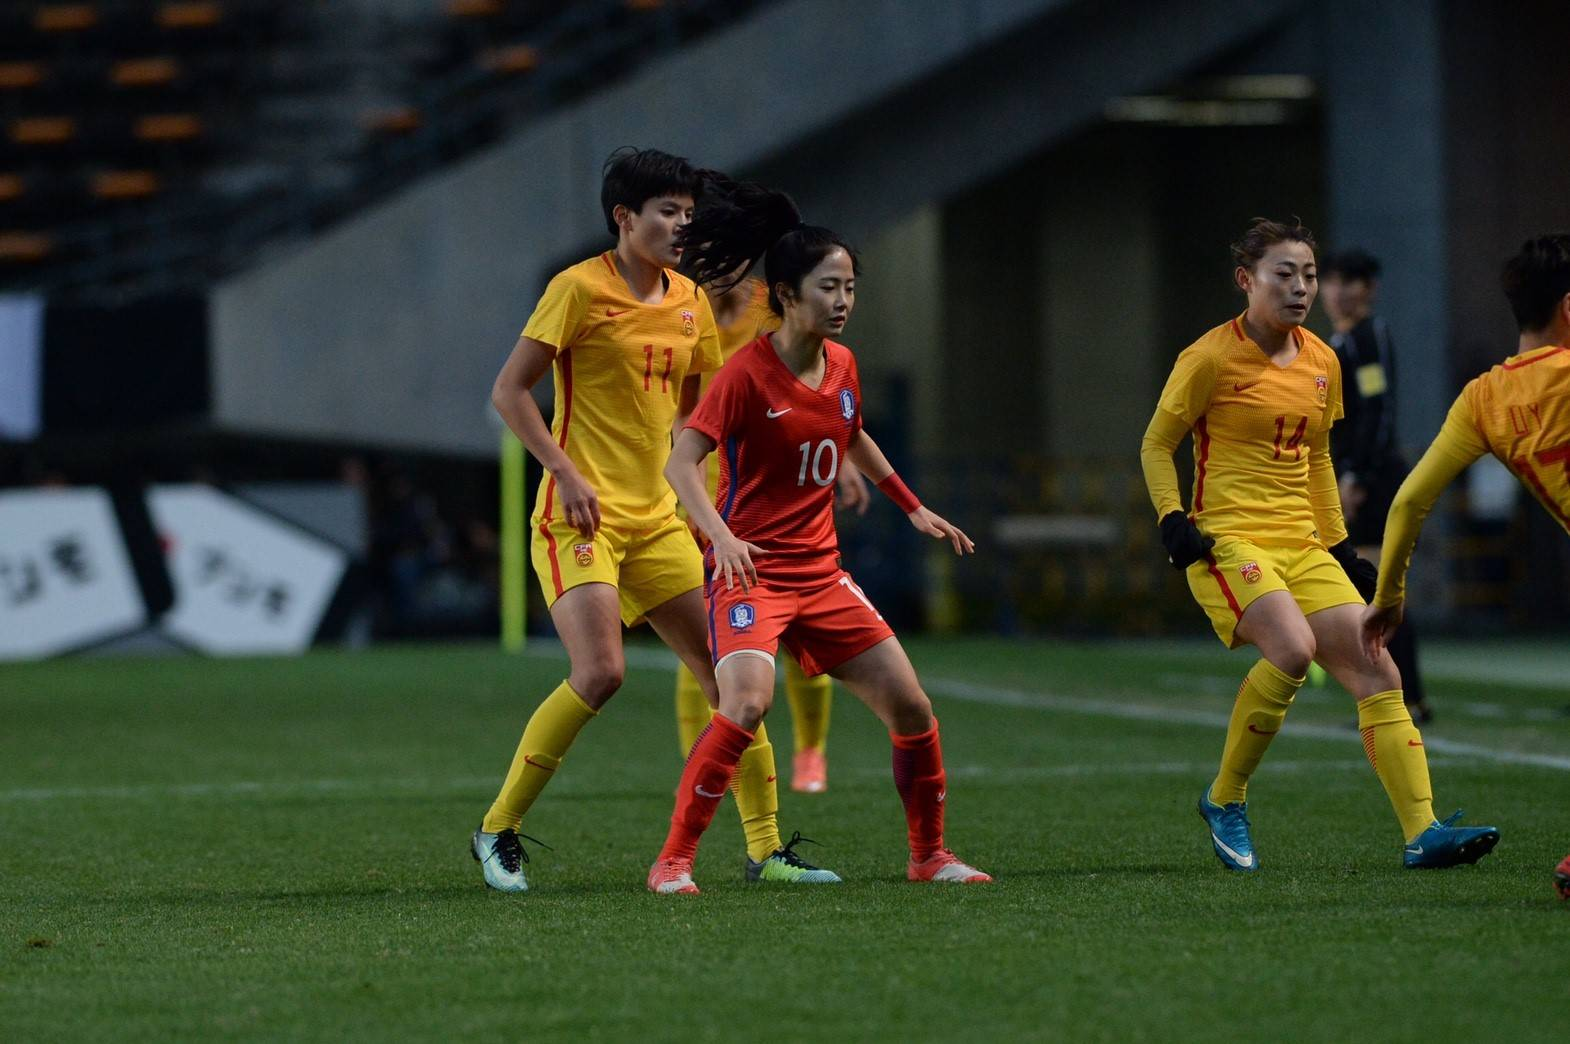 [E-1 챔피언십] 한국 vs 중국 리뷰: 태극낭자, 황사 바람에 휘말리다